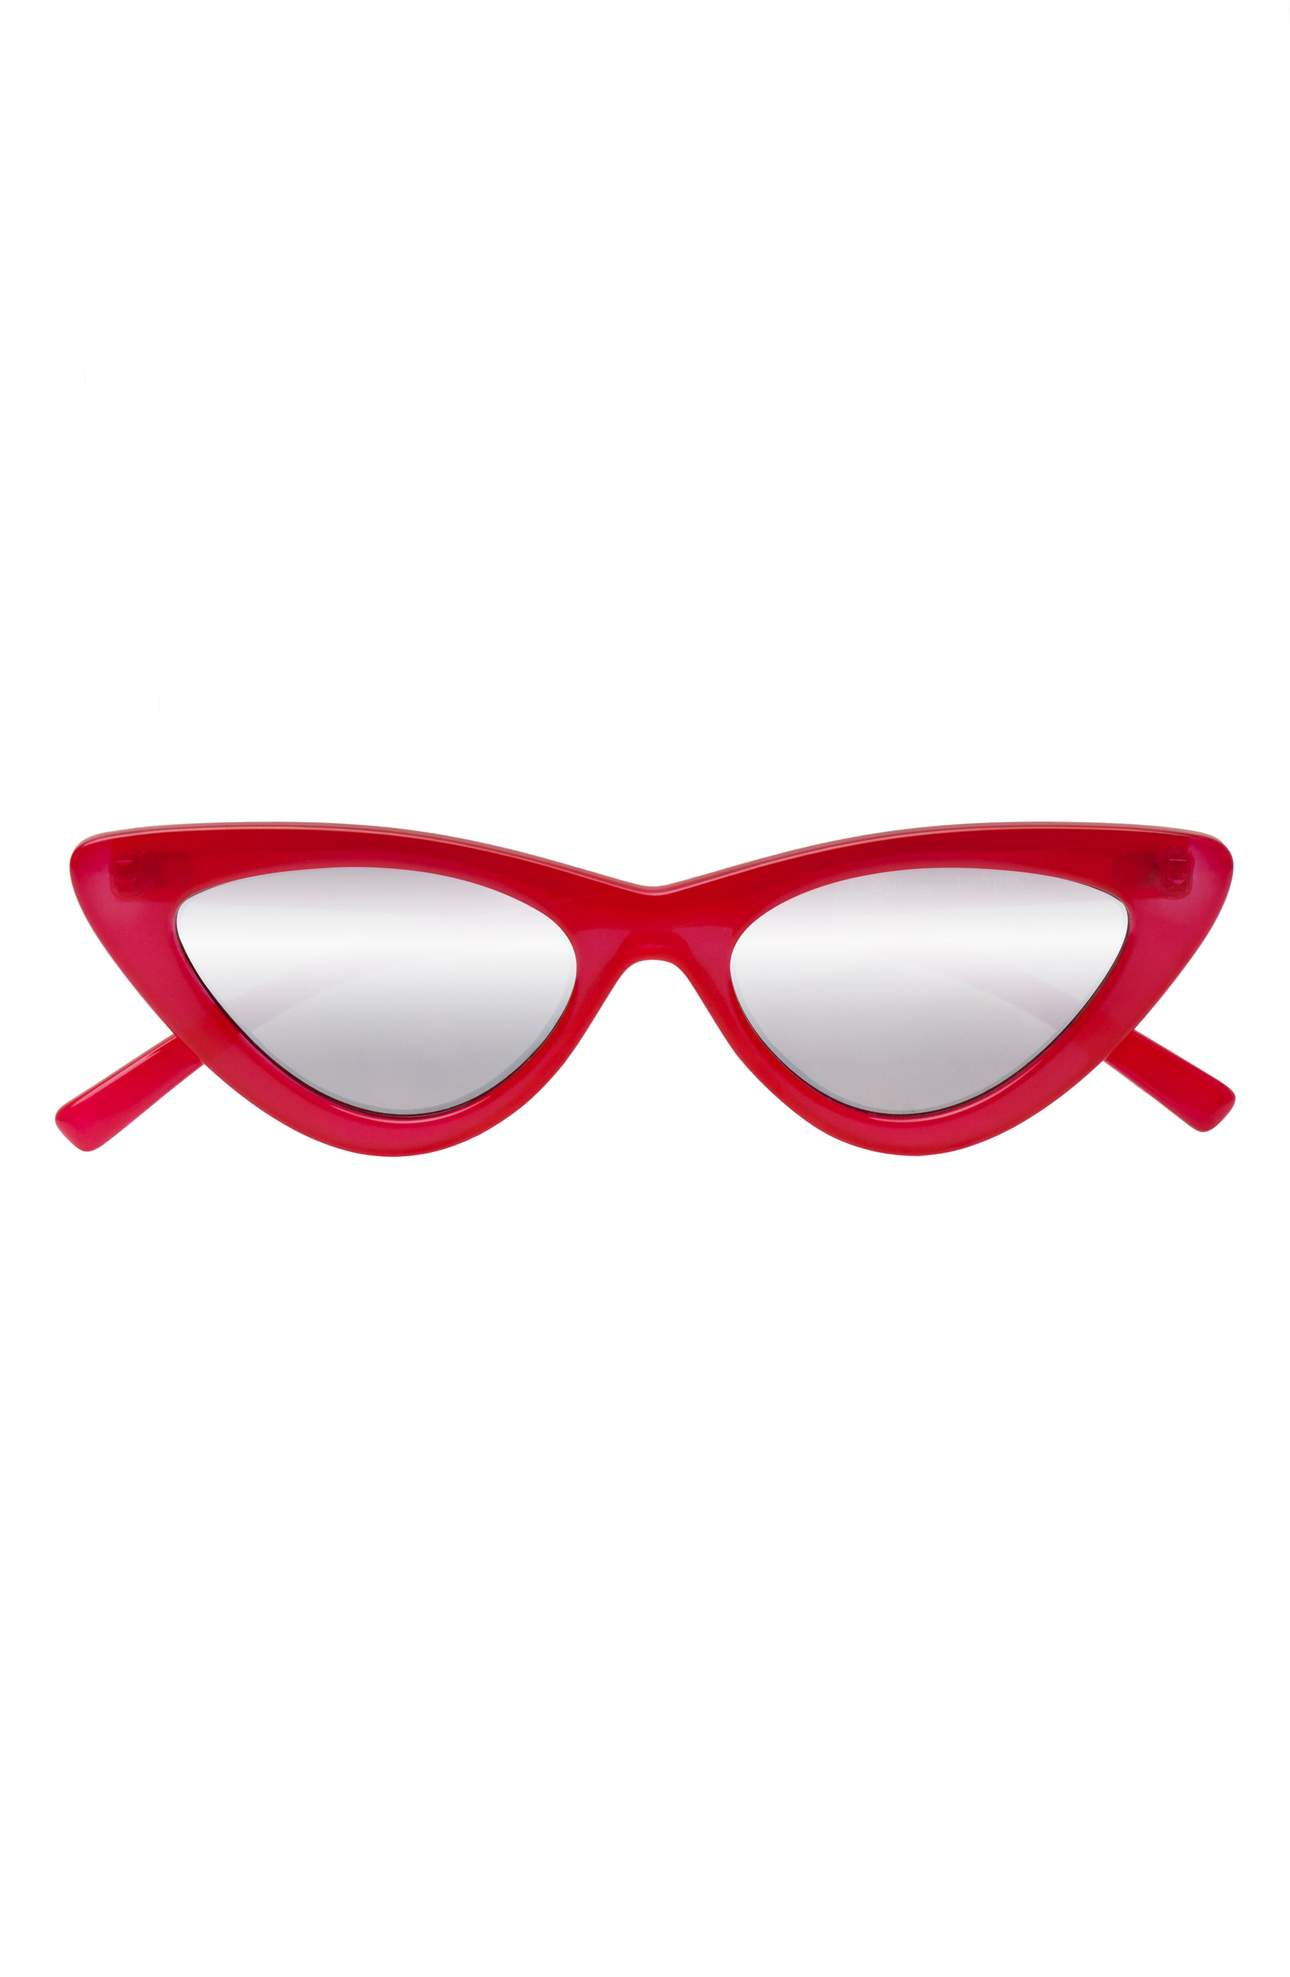 Adam Selman Red Cat Eye Sunglasses.jpg